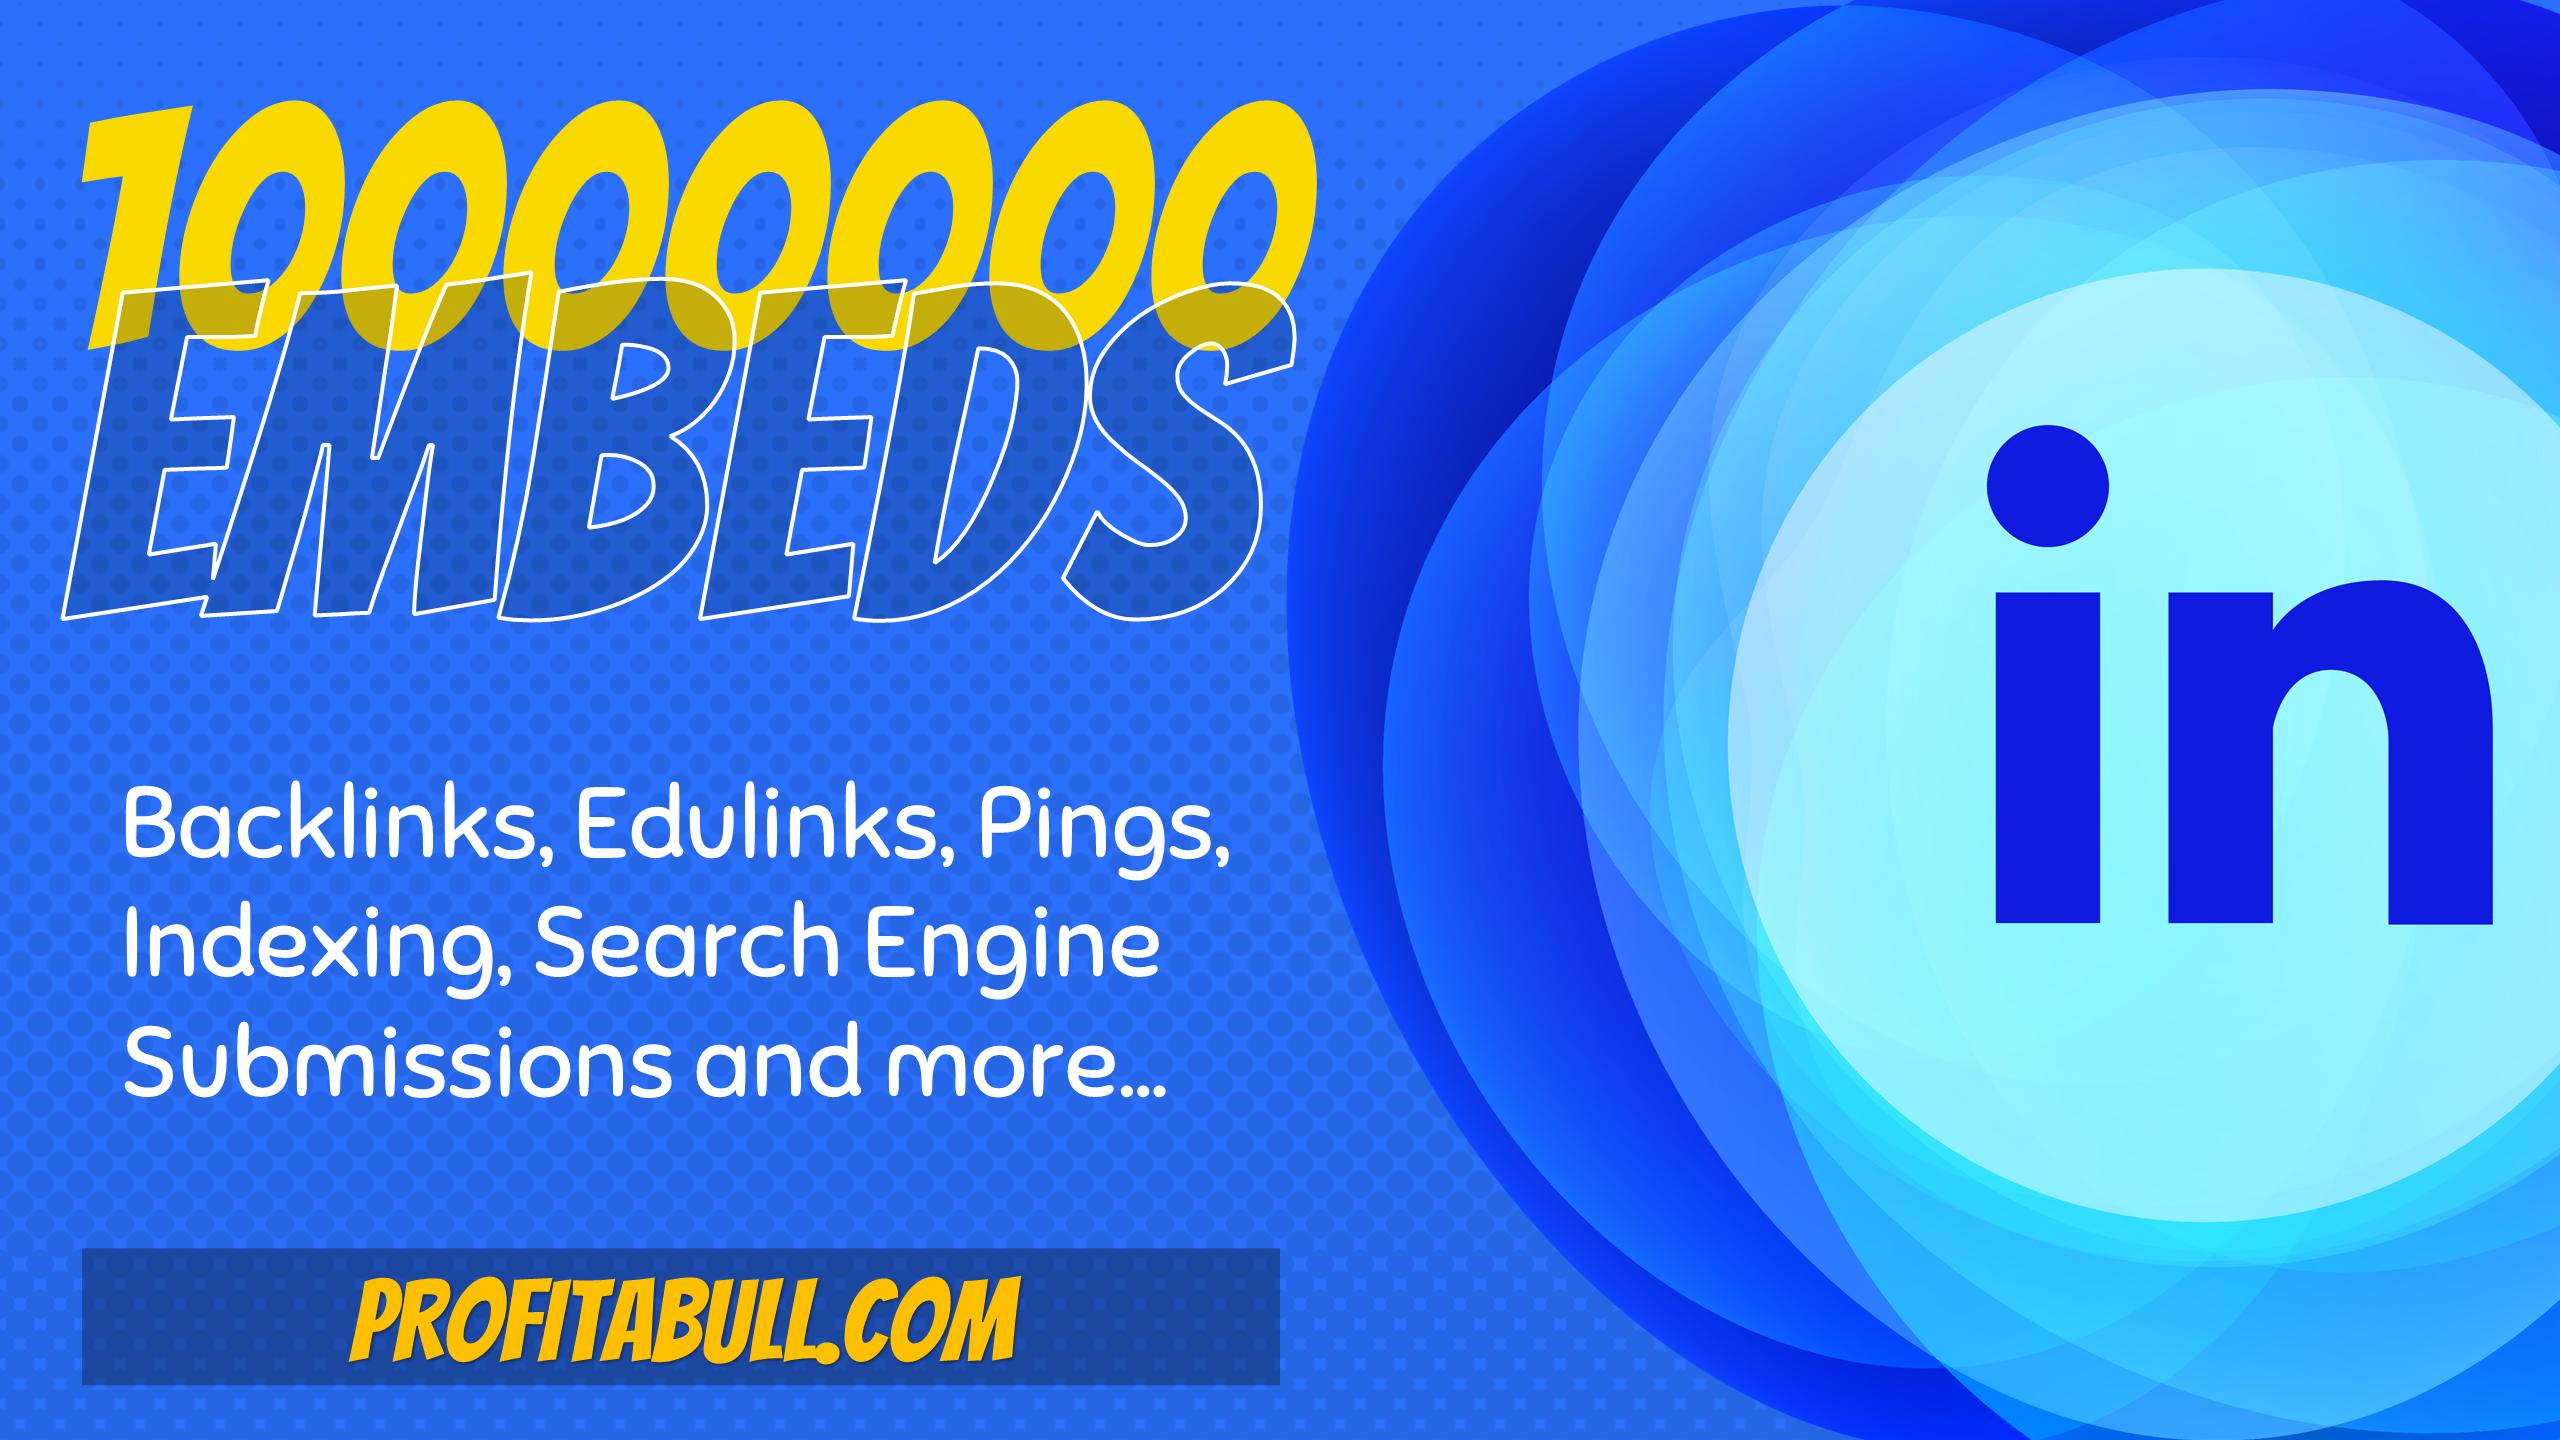 10 Million LinkedIn Post Embeds